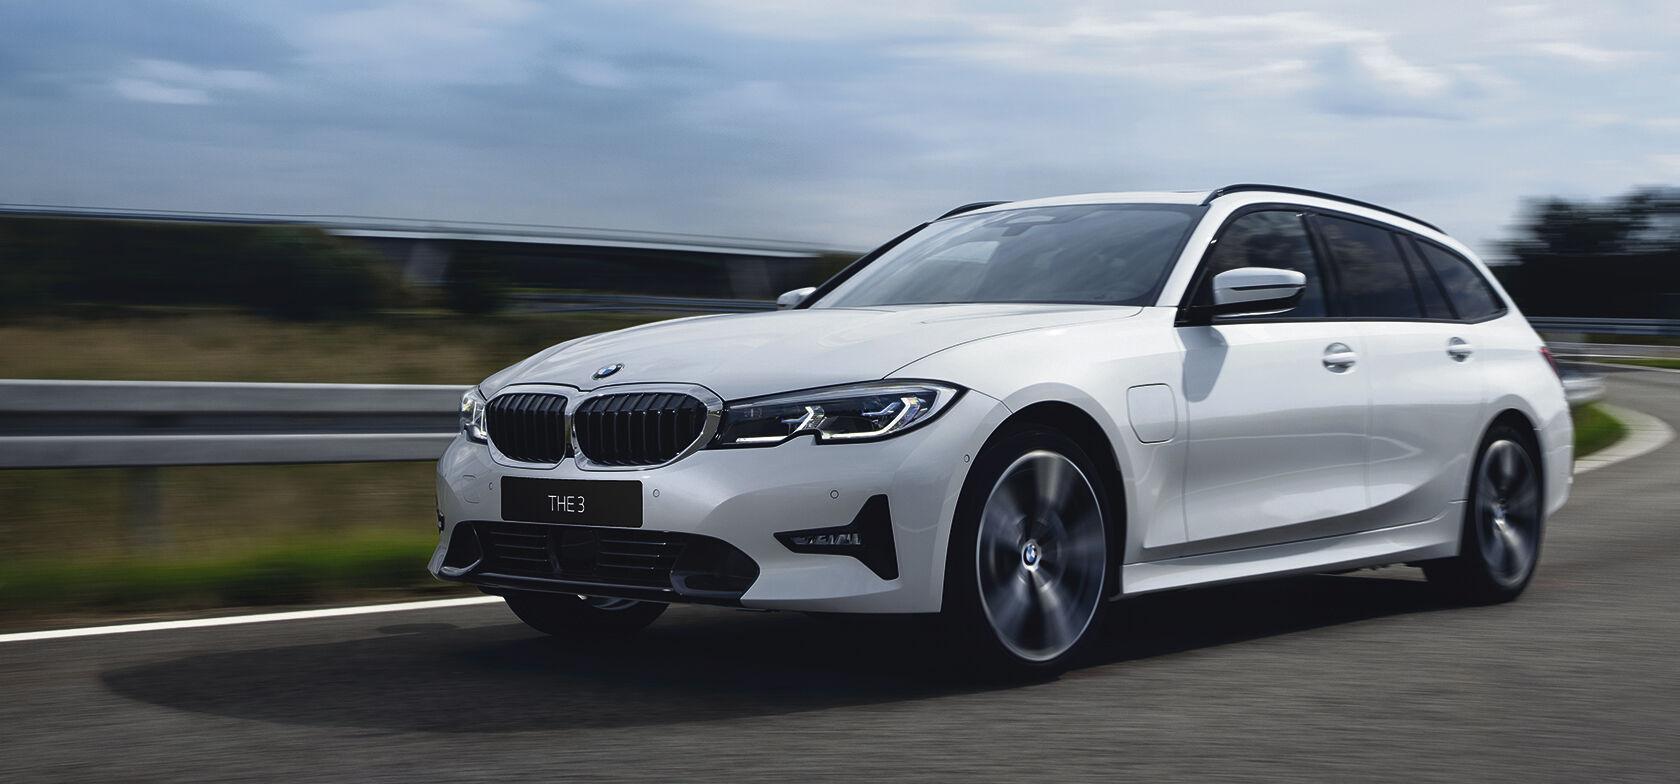 UUSI BMW 320e -malli alk. 44.729 €